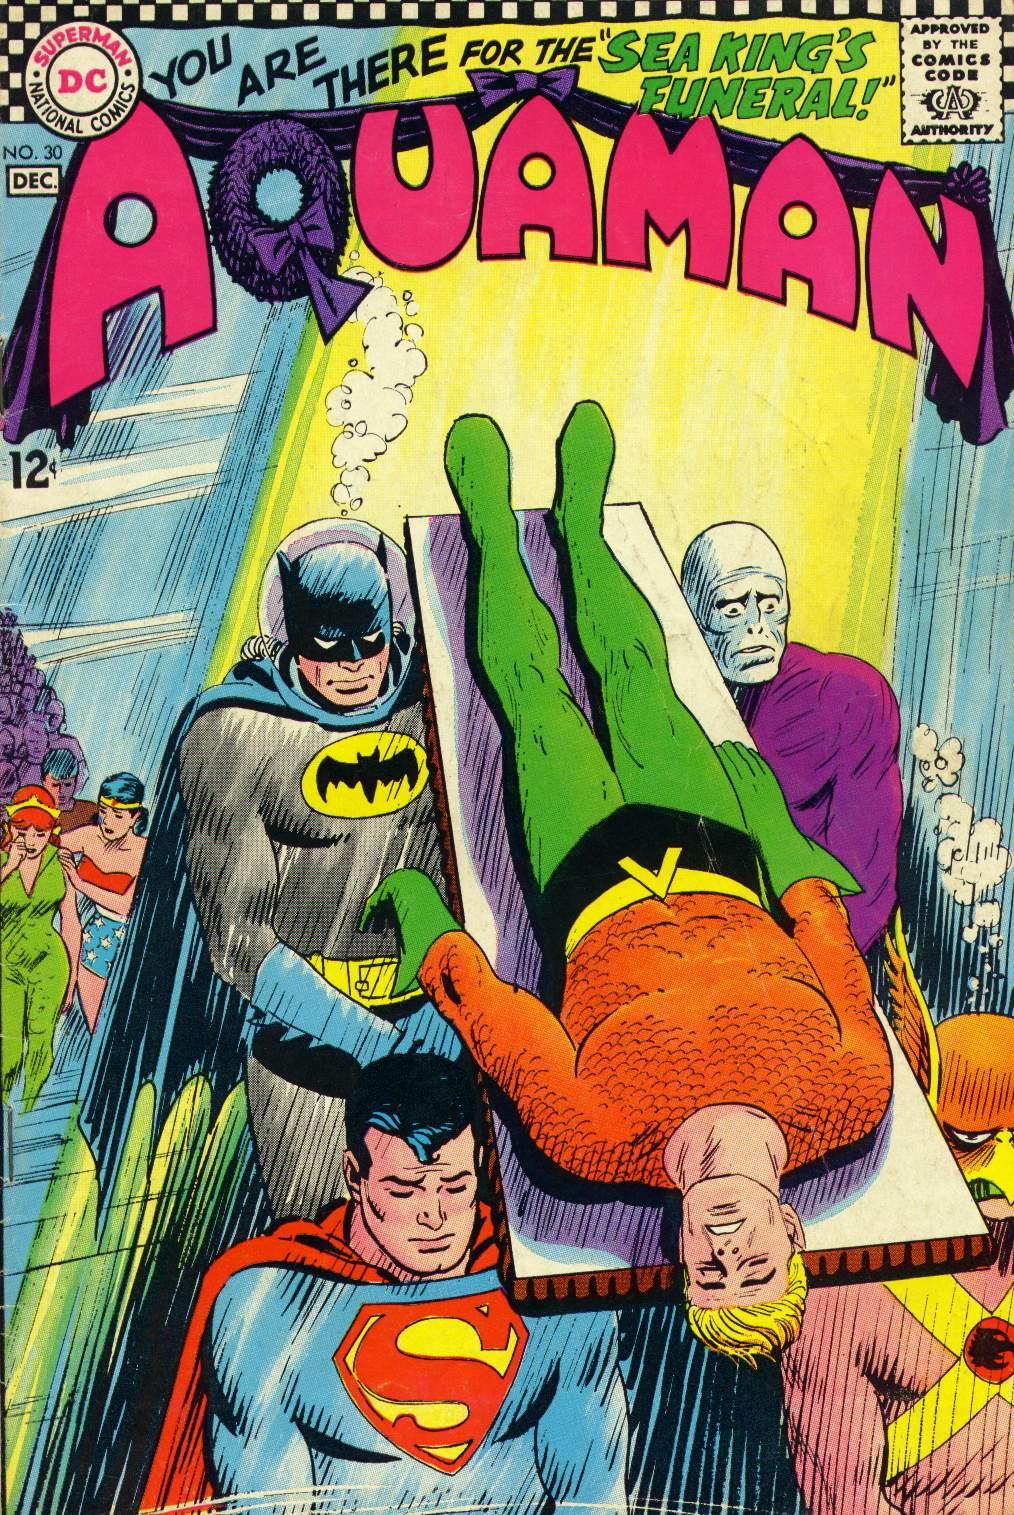 Read online Aquaman (1962) comic -  Issue #30 - 1